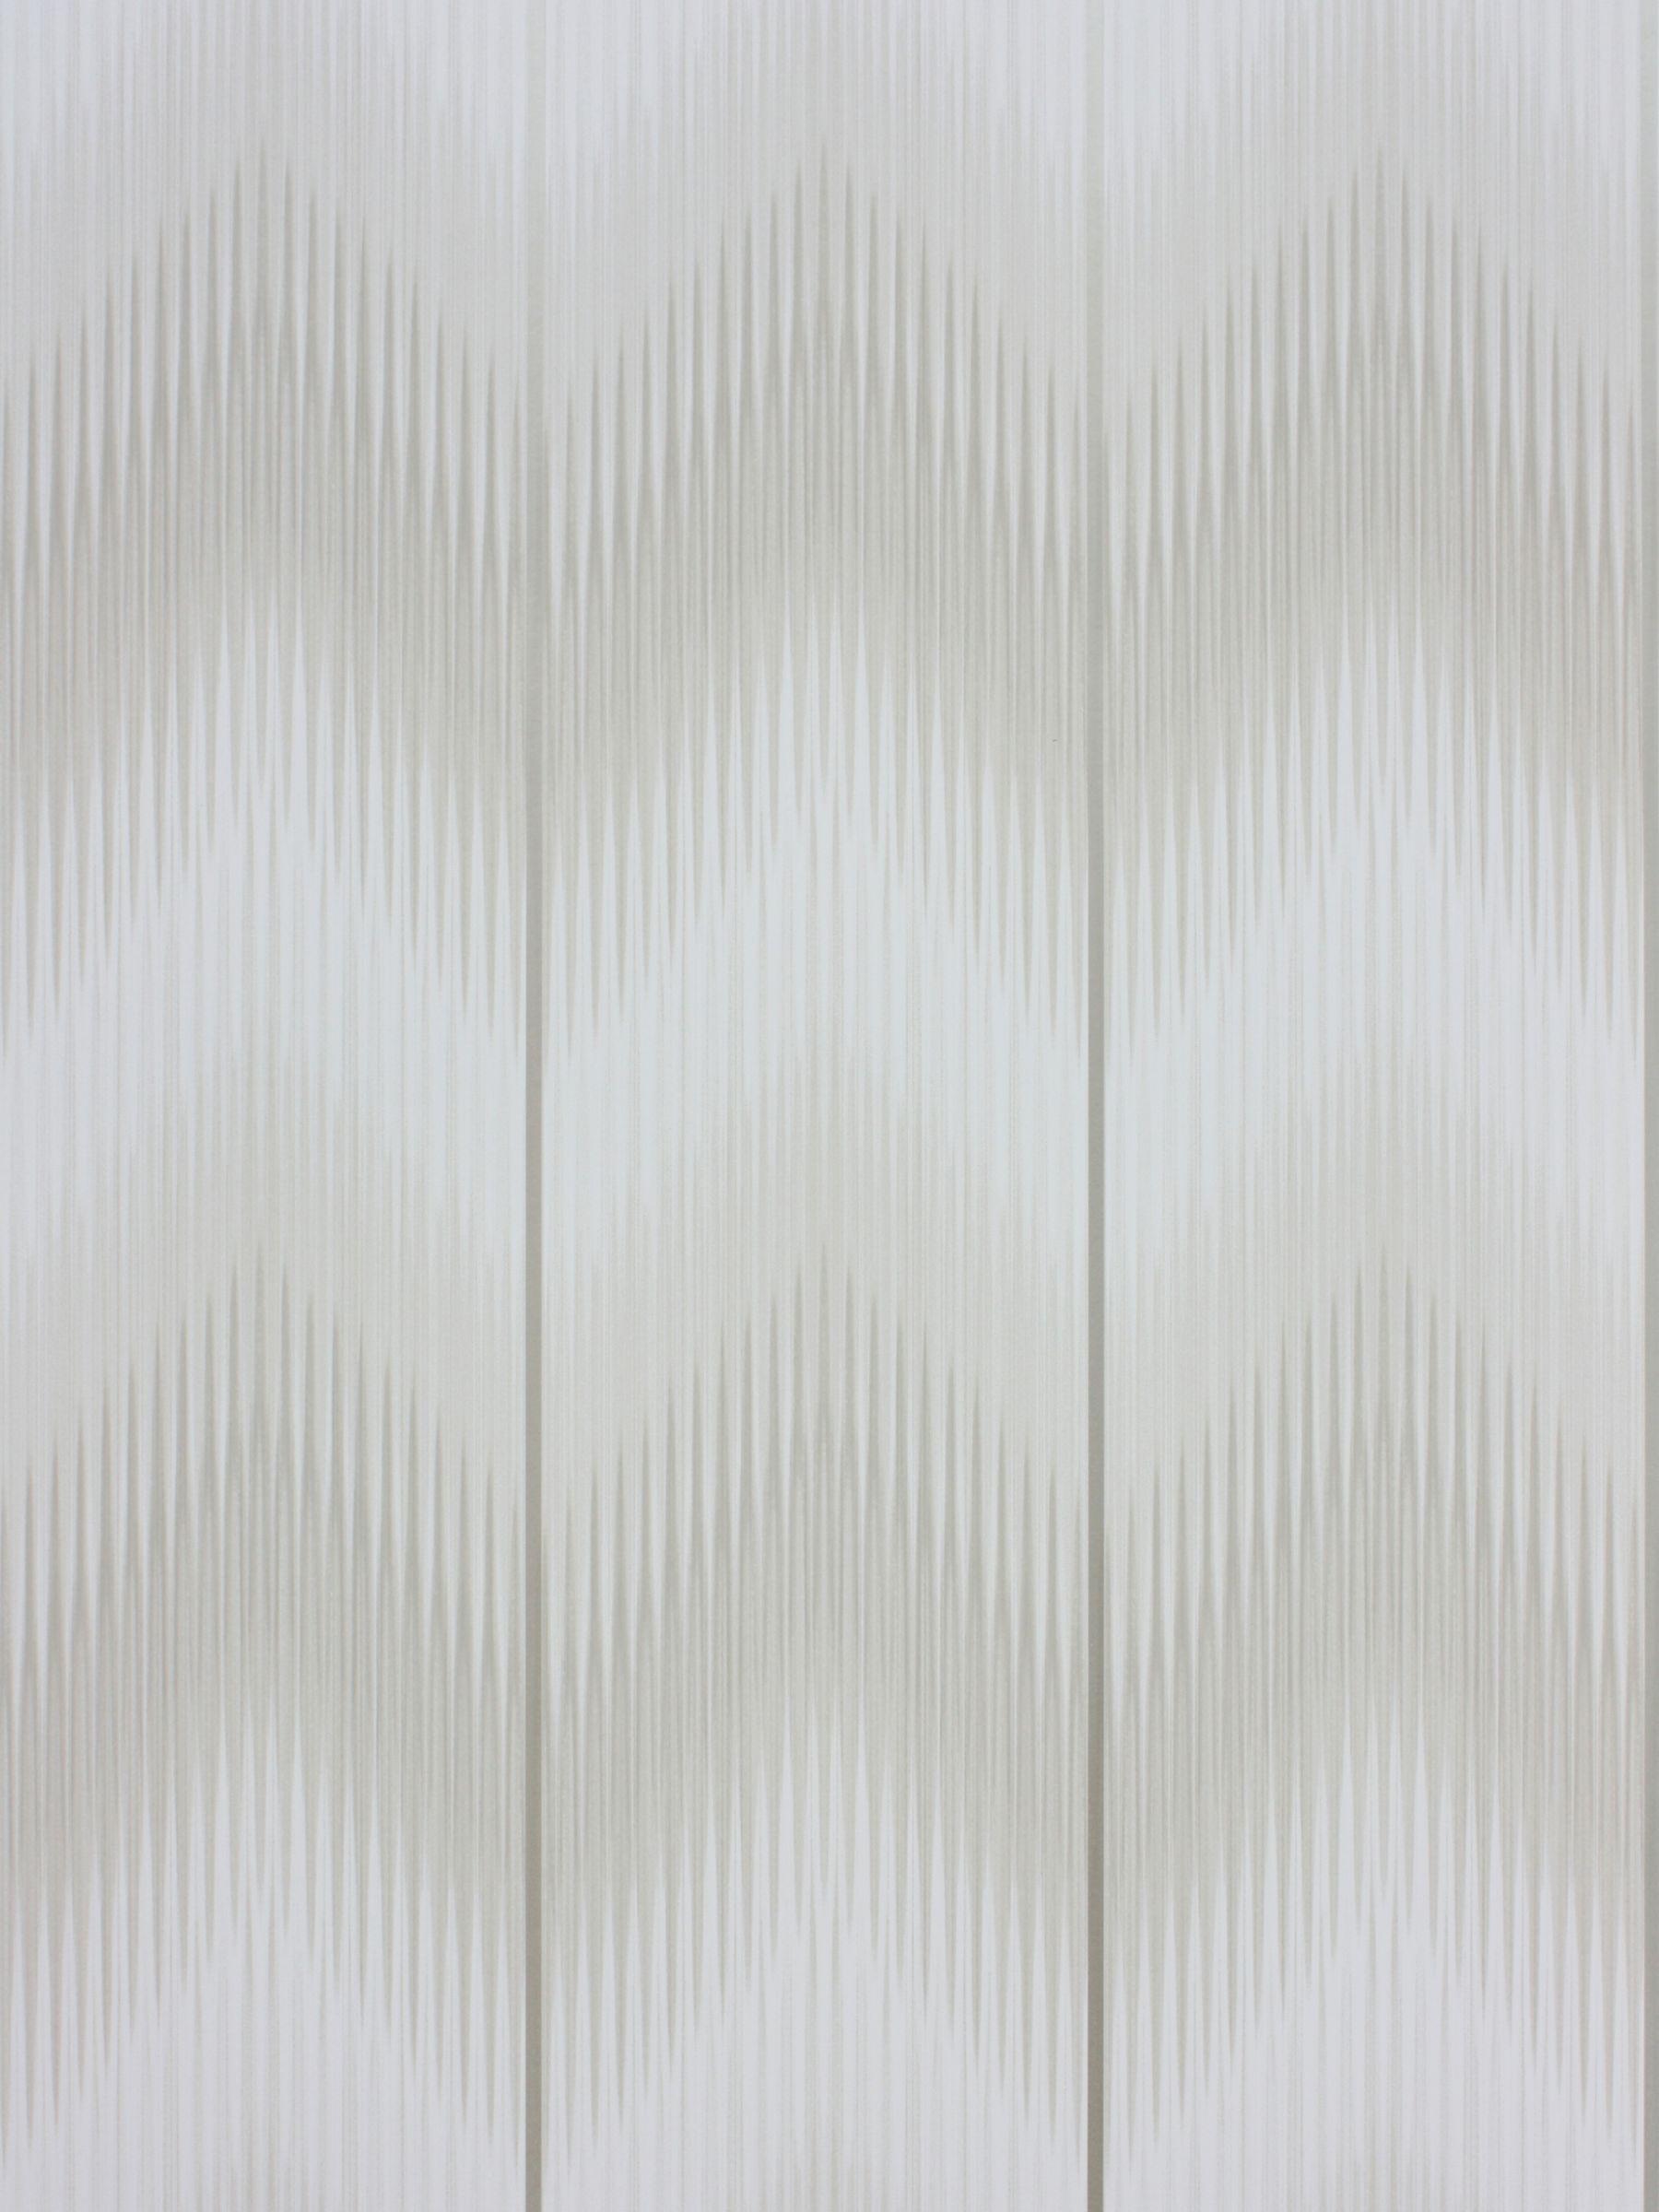 Matthew Williamson Matthew Williamson Danzon Wallpaper